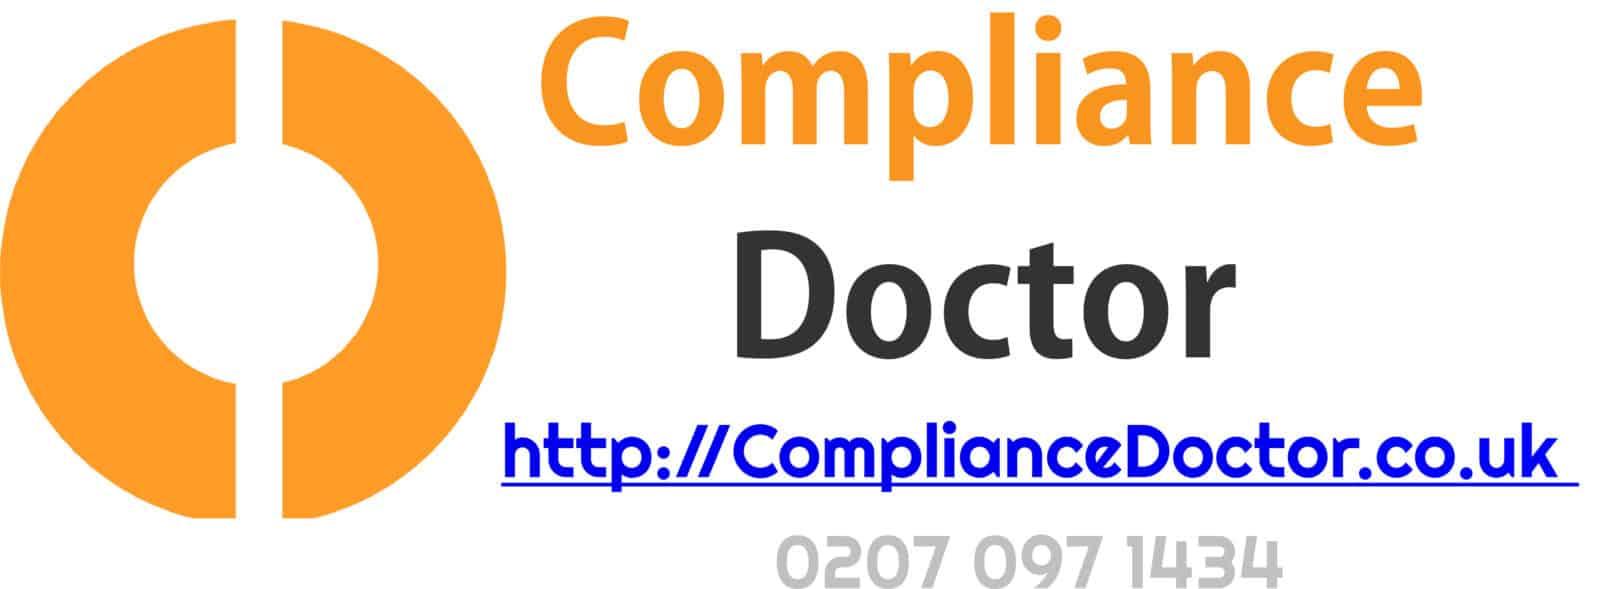 fca authorisation consultant specialist compliance